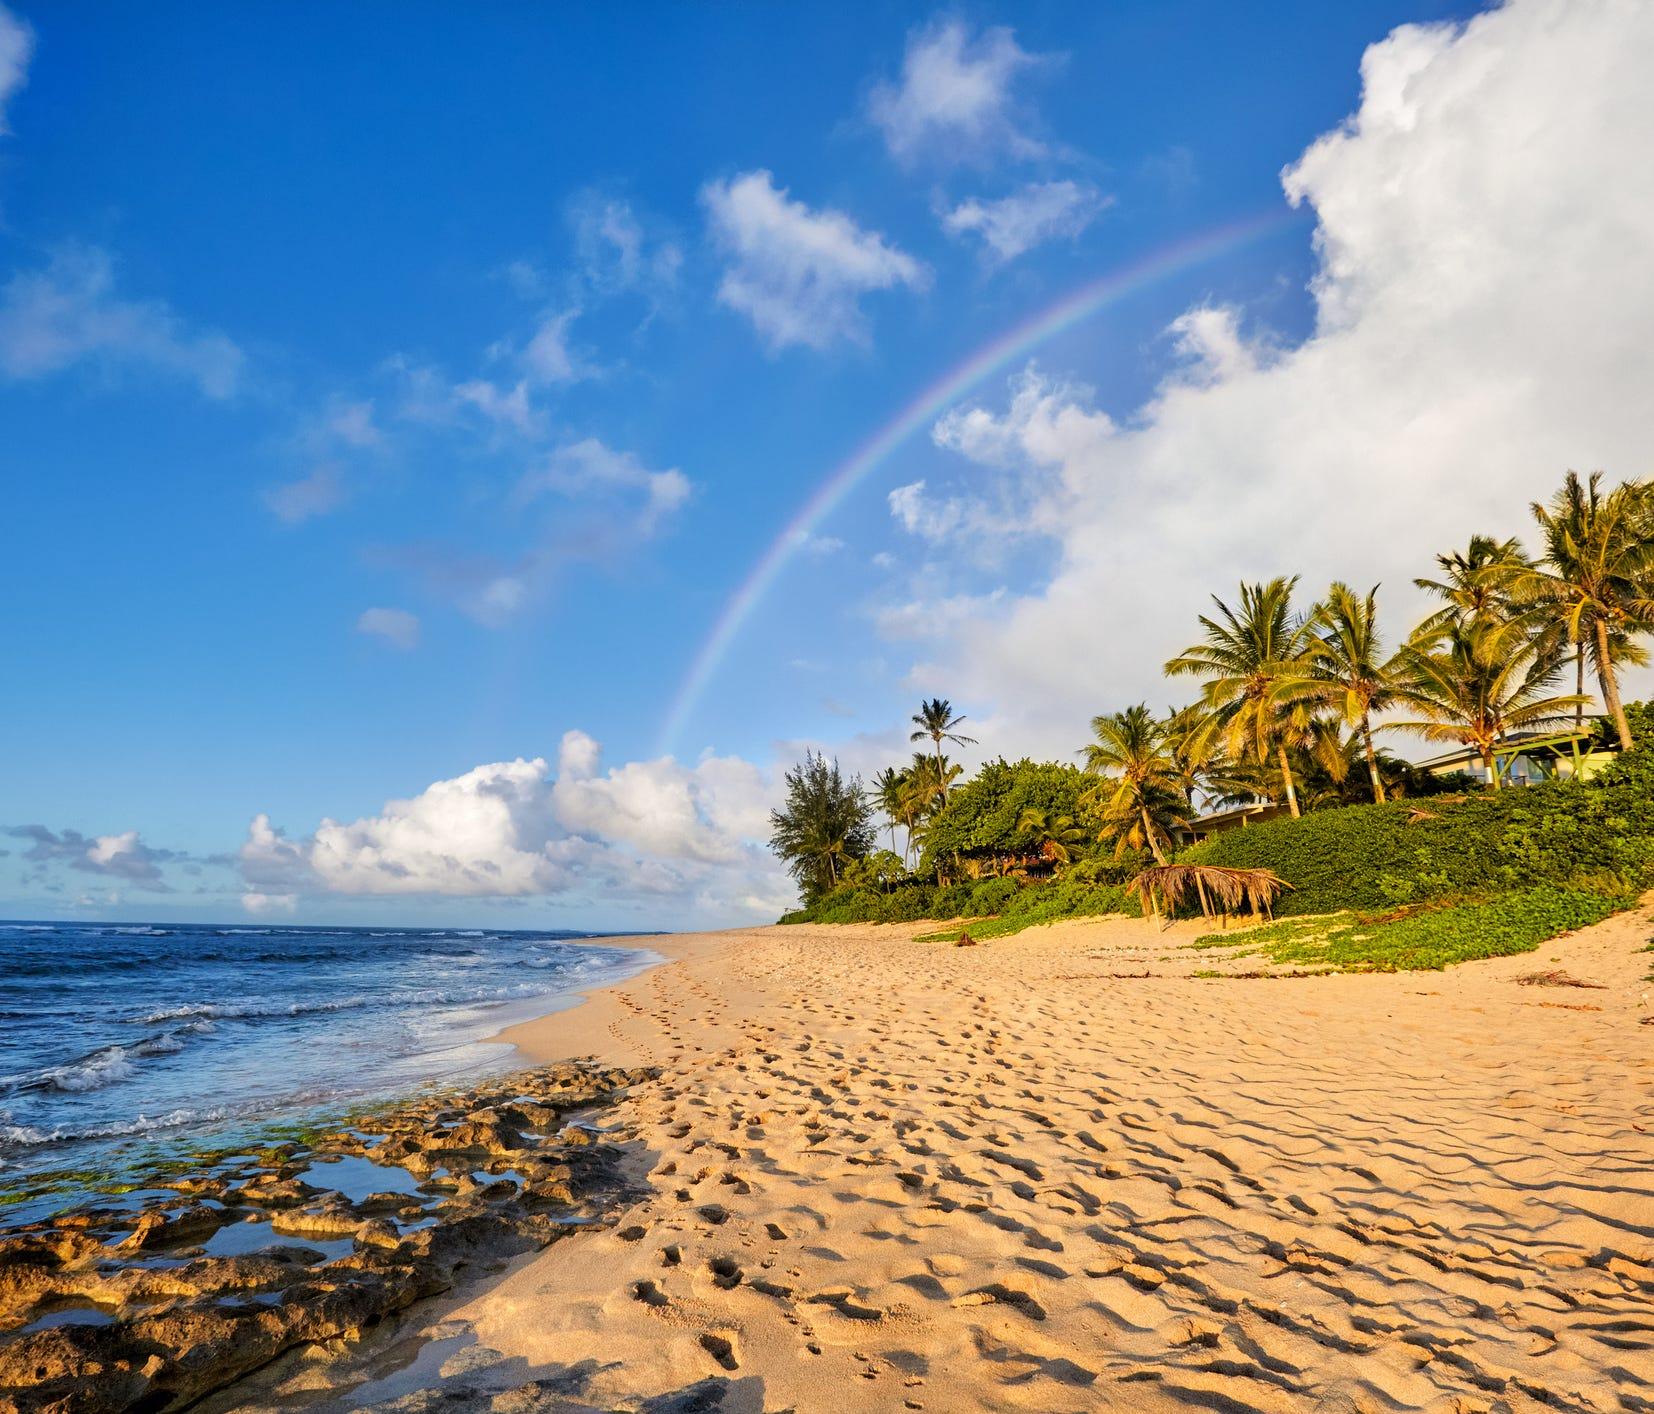 Sunset Beach, North Shore, Oahu, Hawaii.